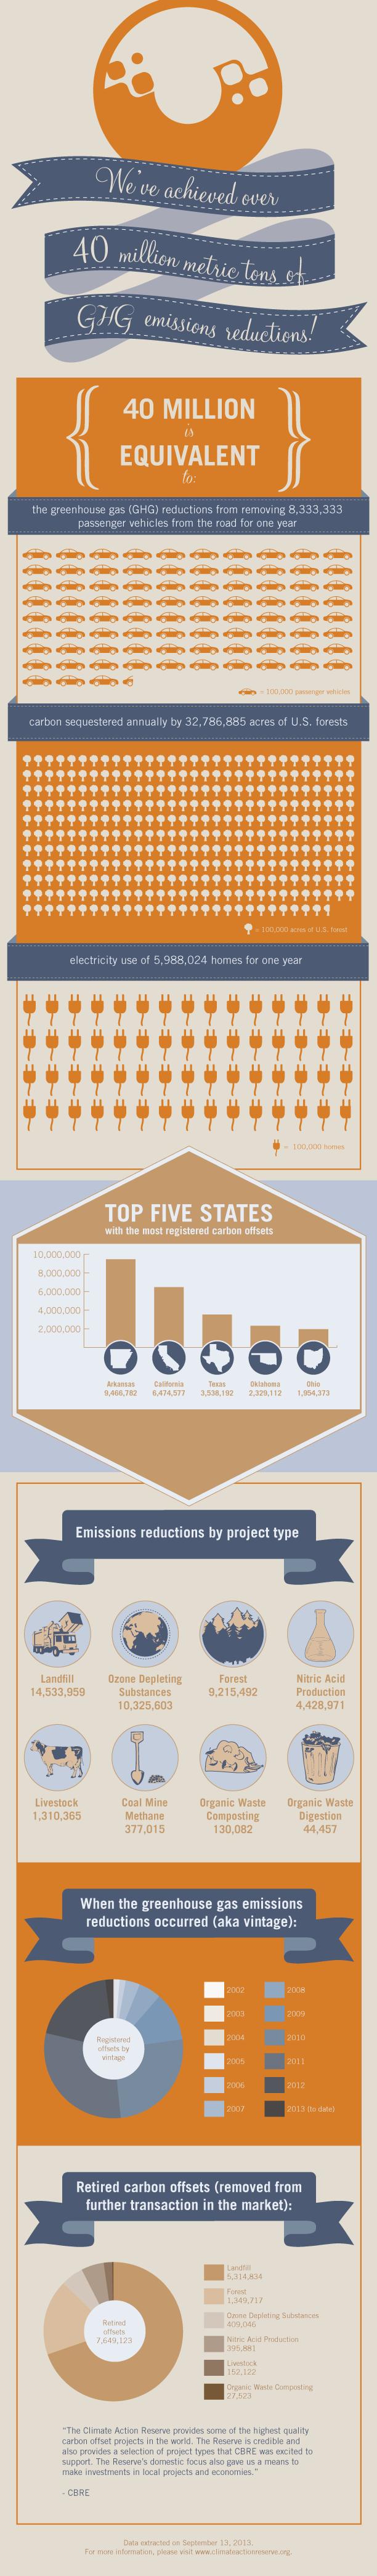 infographic-40million